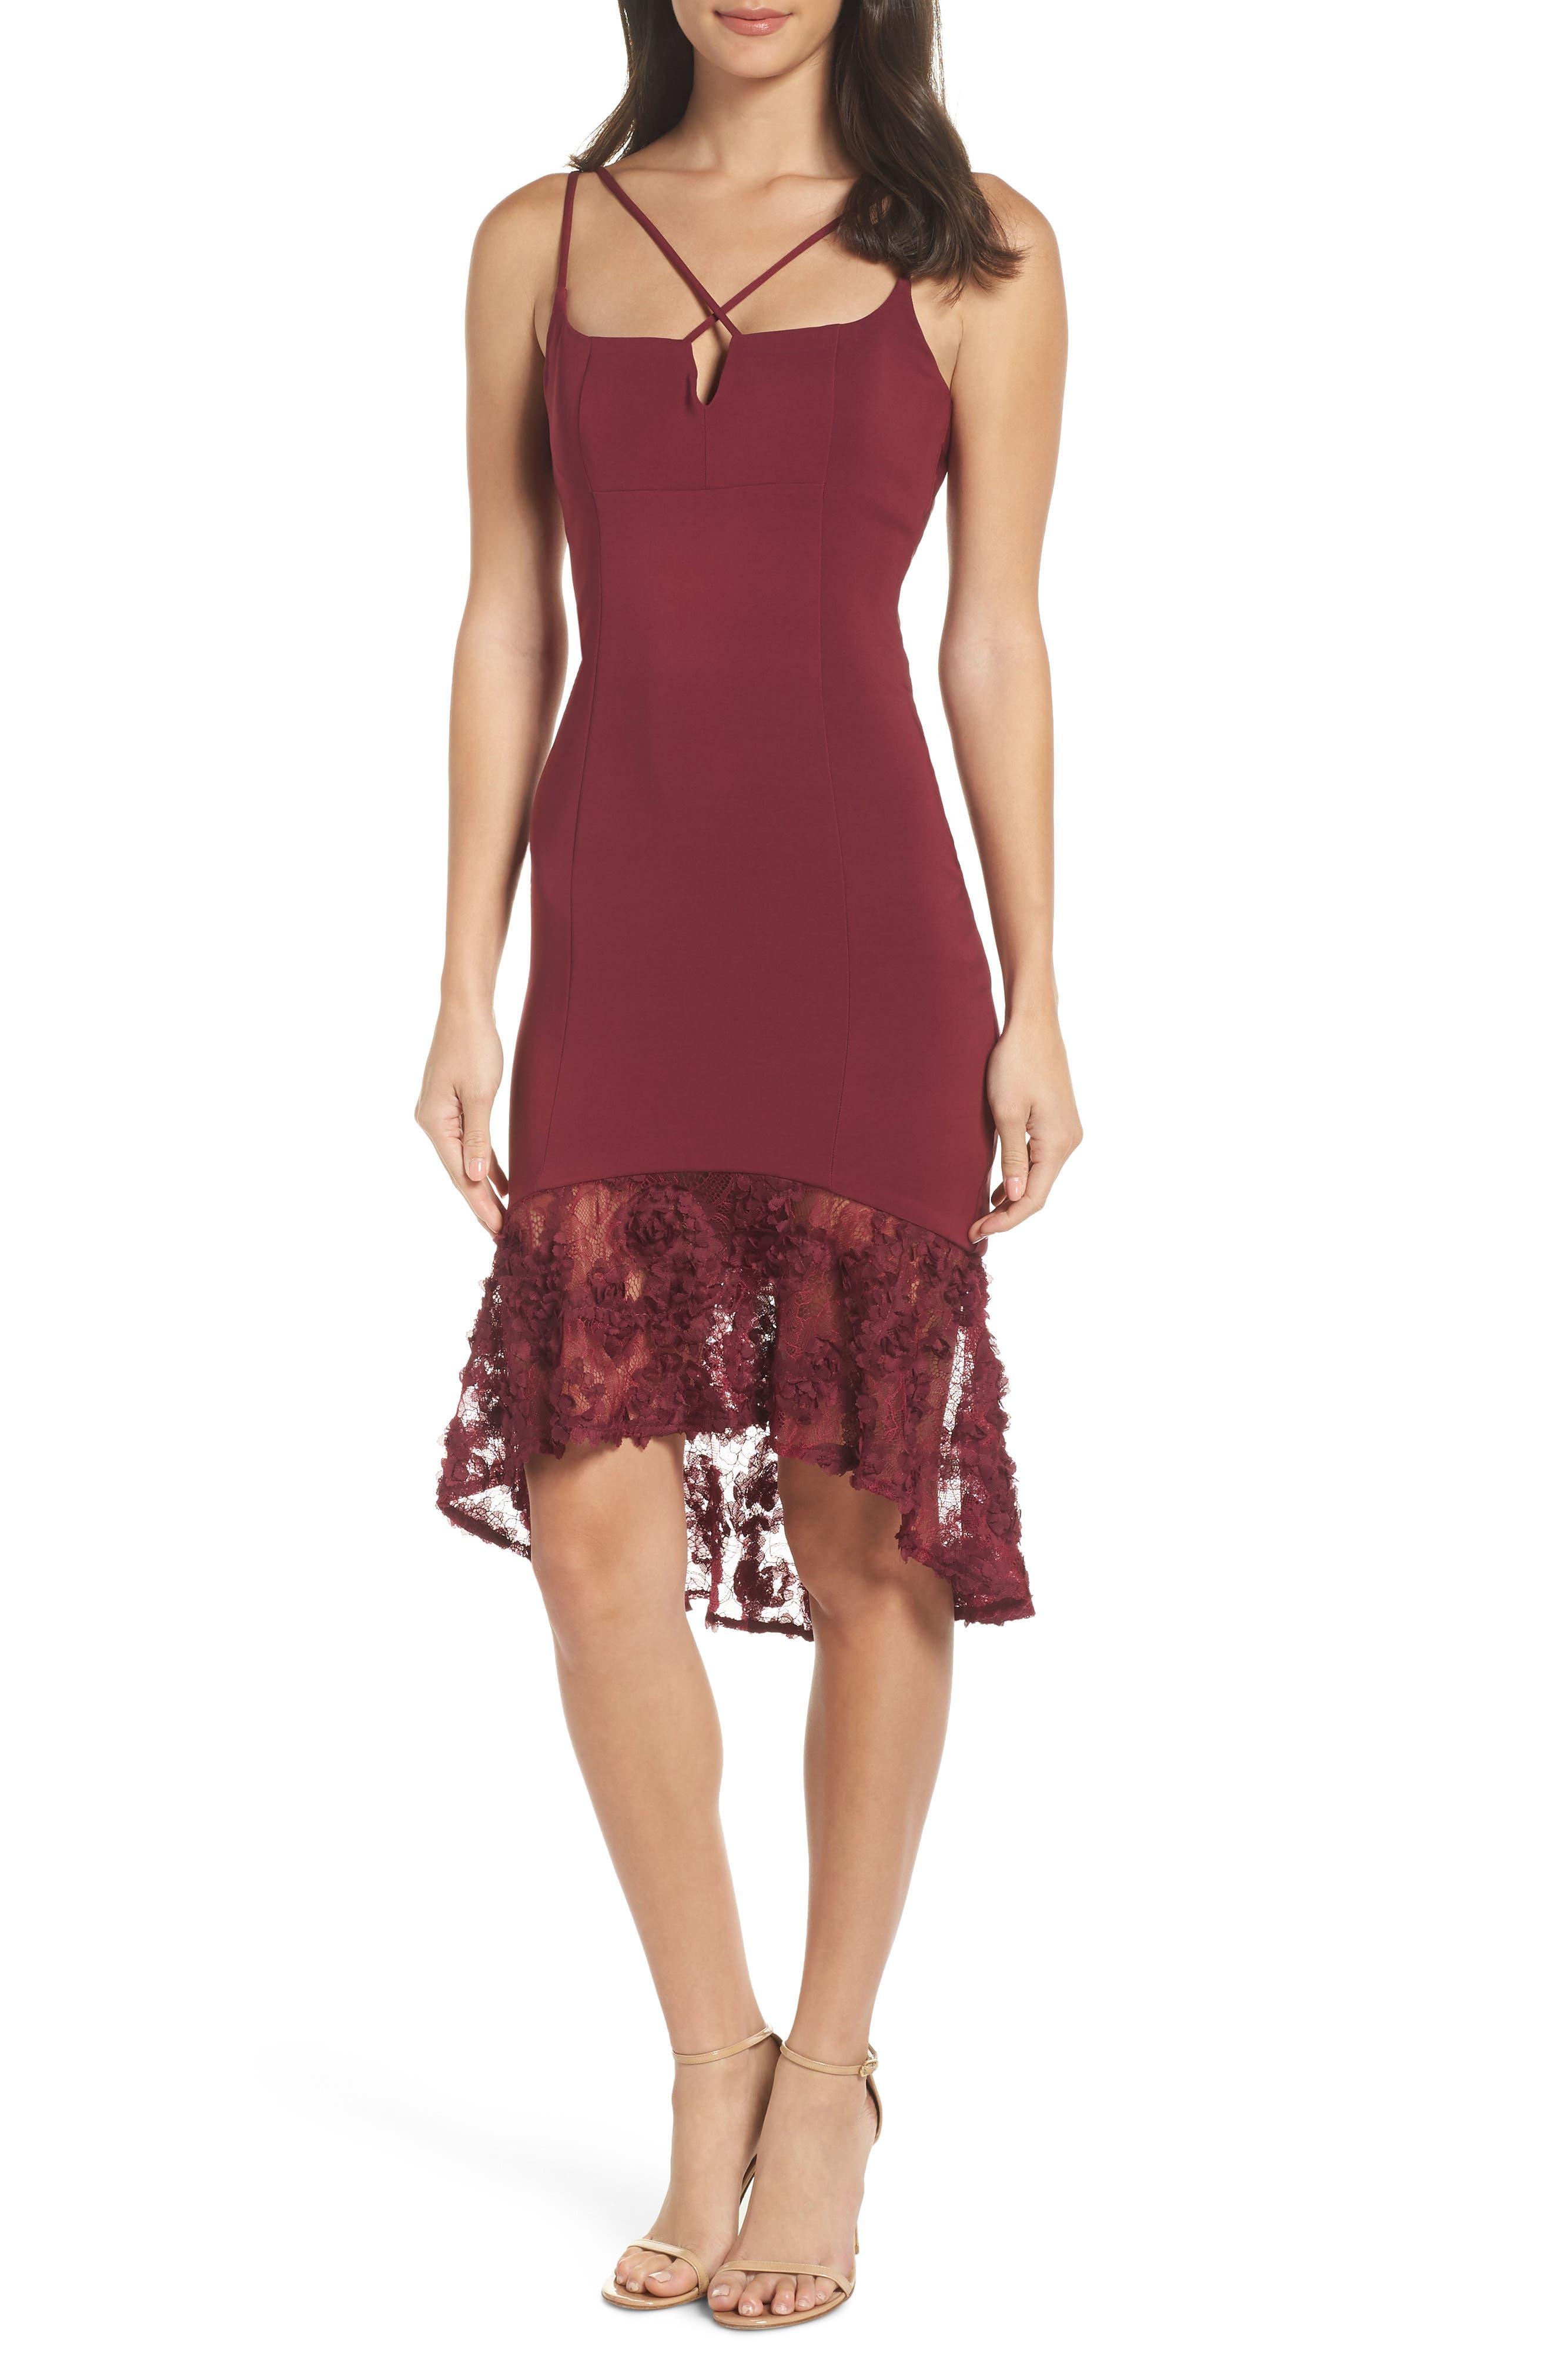 MARIA BIANCA NERO Mackenna Body-Con Dress in Burgundy